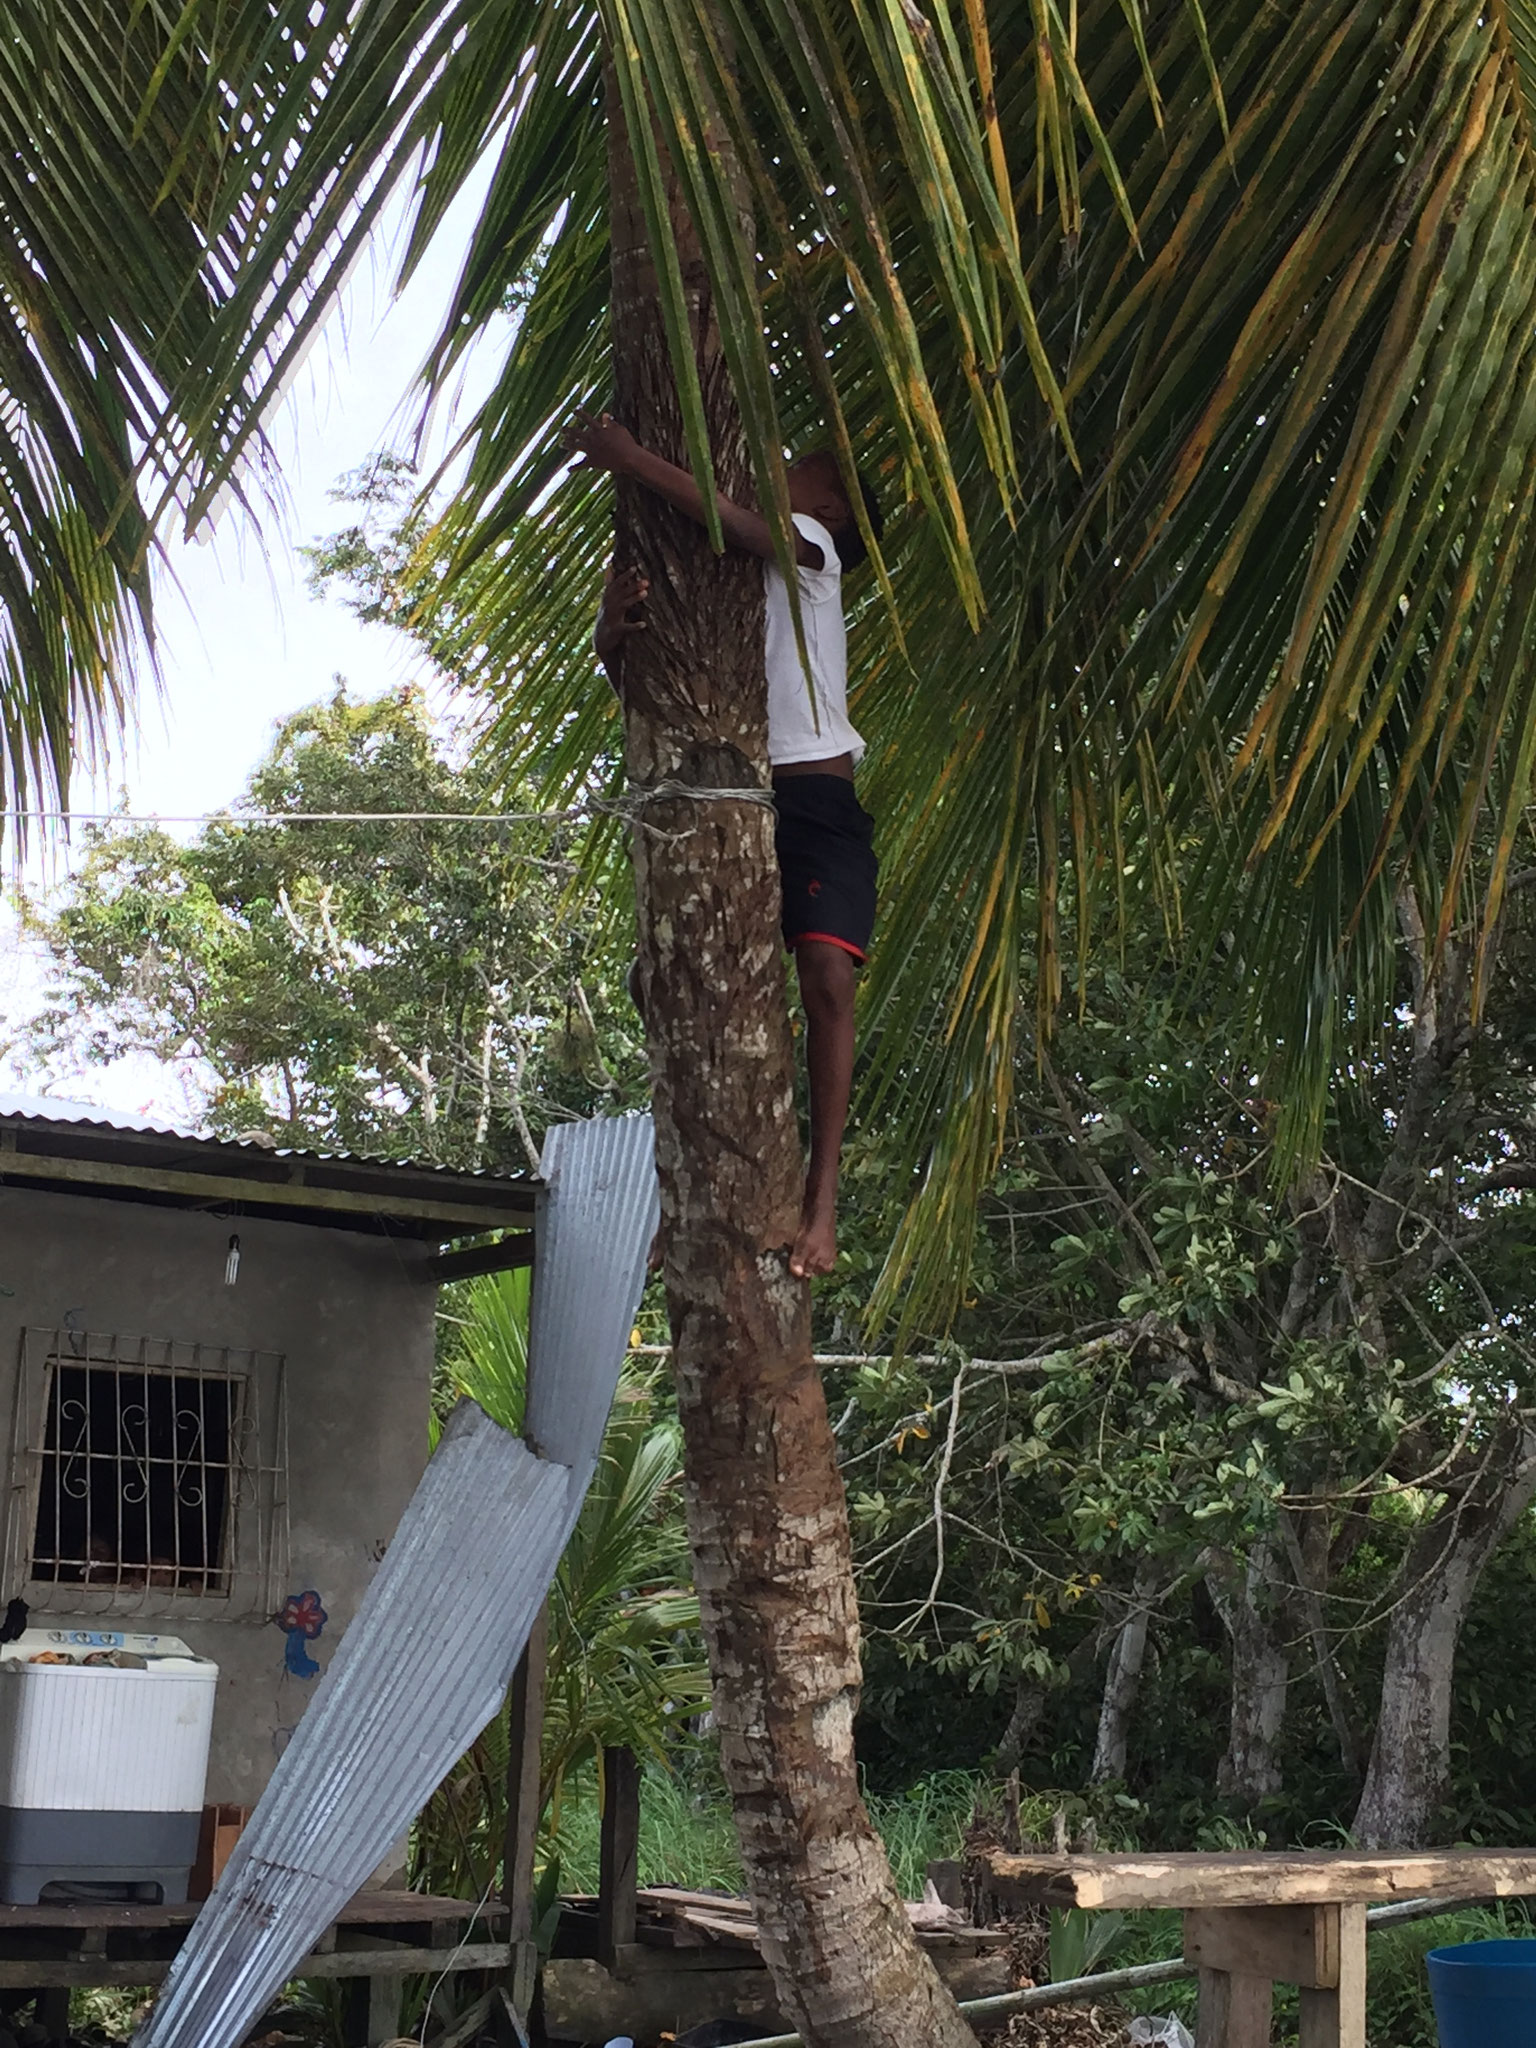 Kokos holen vom Baum